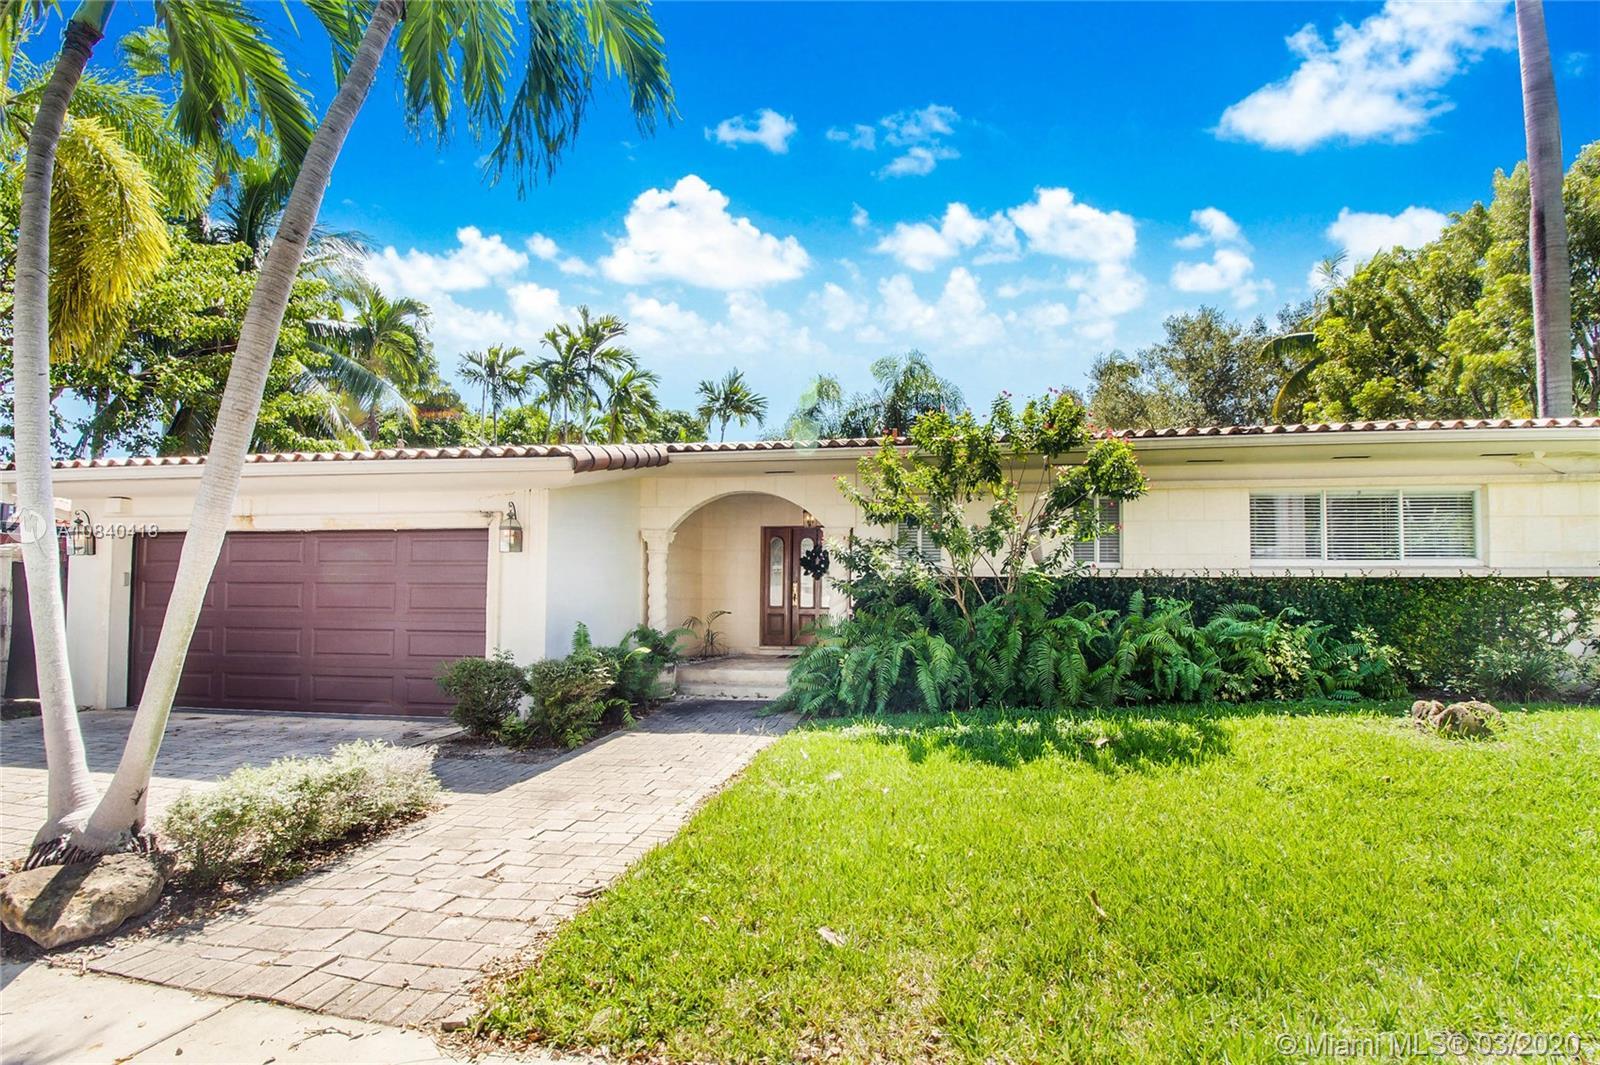 120 W Shore Dr W, Miami, Florida 33133, 3 Bedrooms Bedrooms, ,2 BathroomsBathrooms,Residential,For Sale,120 W Shore Dr W,A10840418